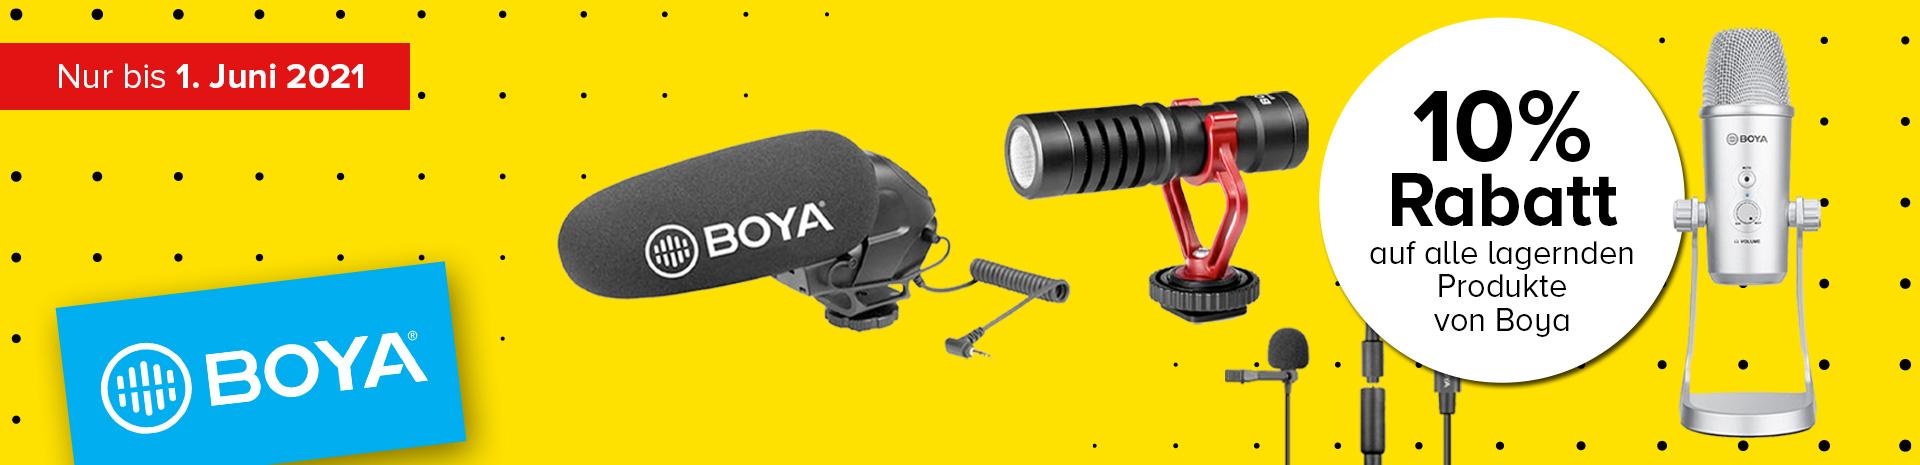 Boya Deal